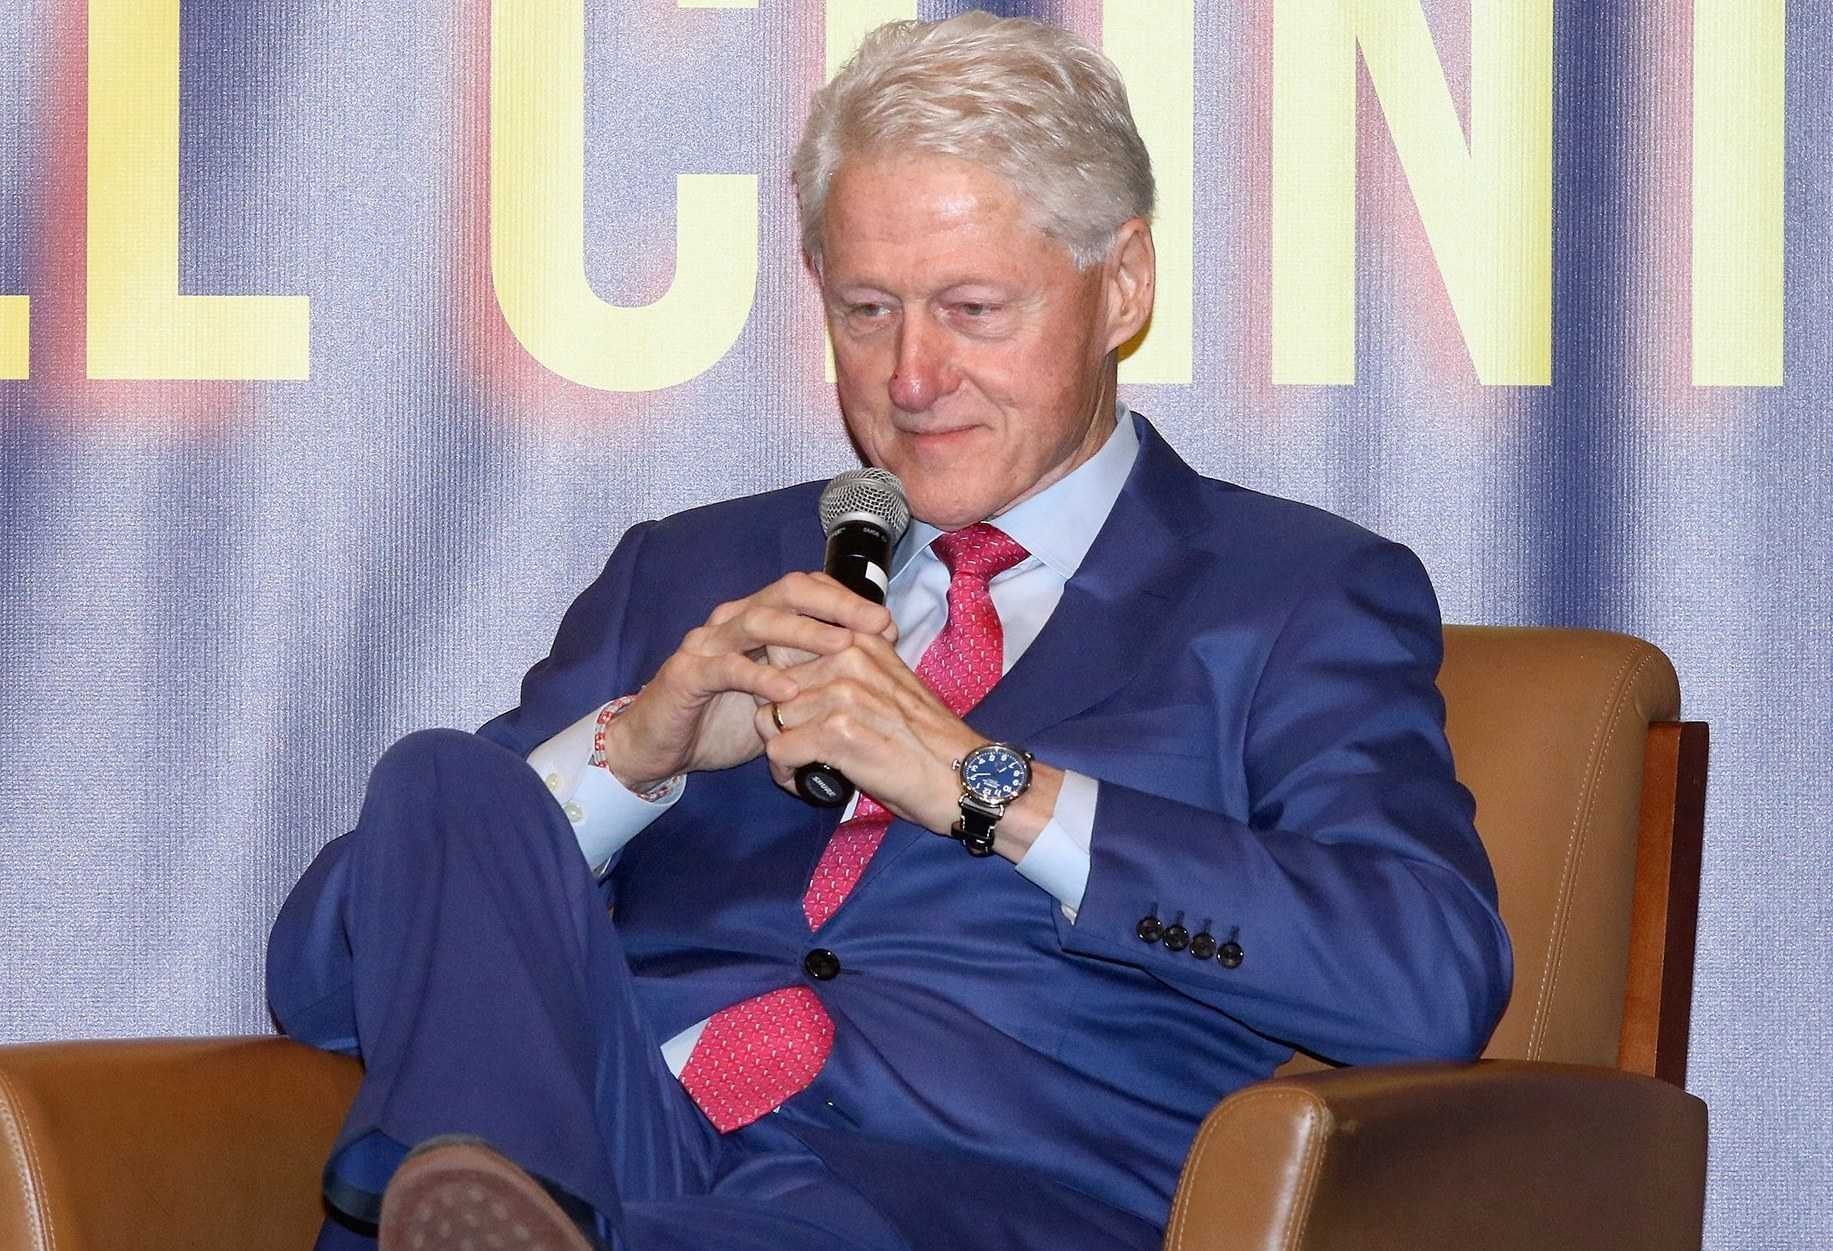 Bill Clinton Governor